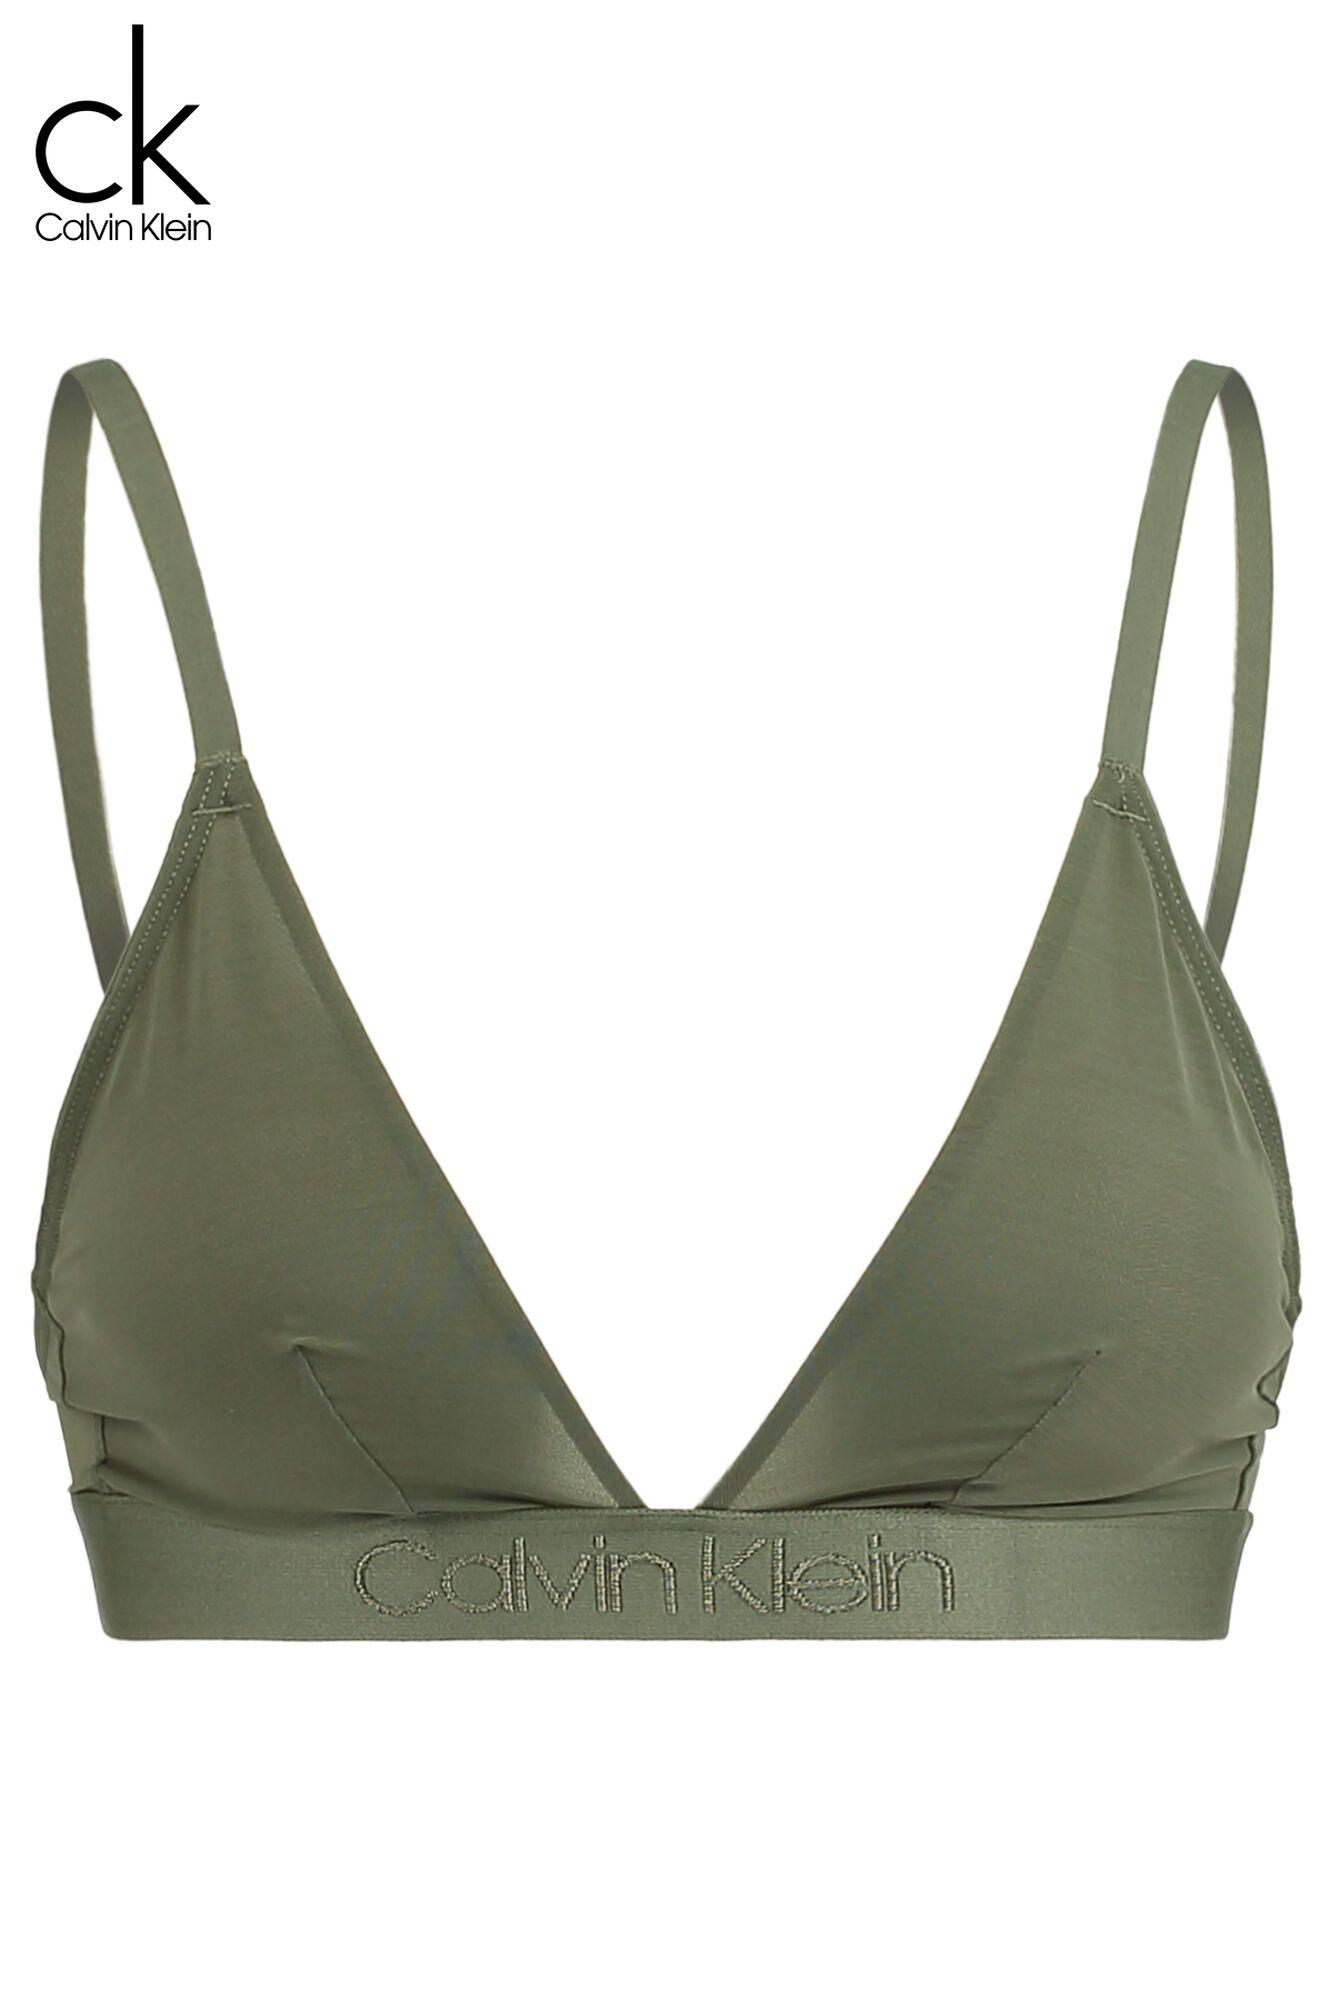 1e3fb2844e8660 Women Bralette Calvin Klein Unlined Triangle Green Buy Online